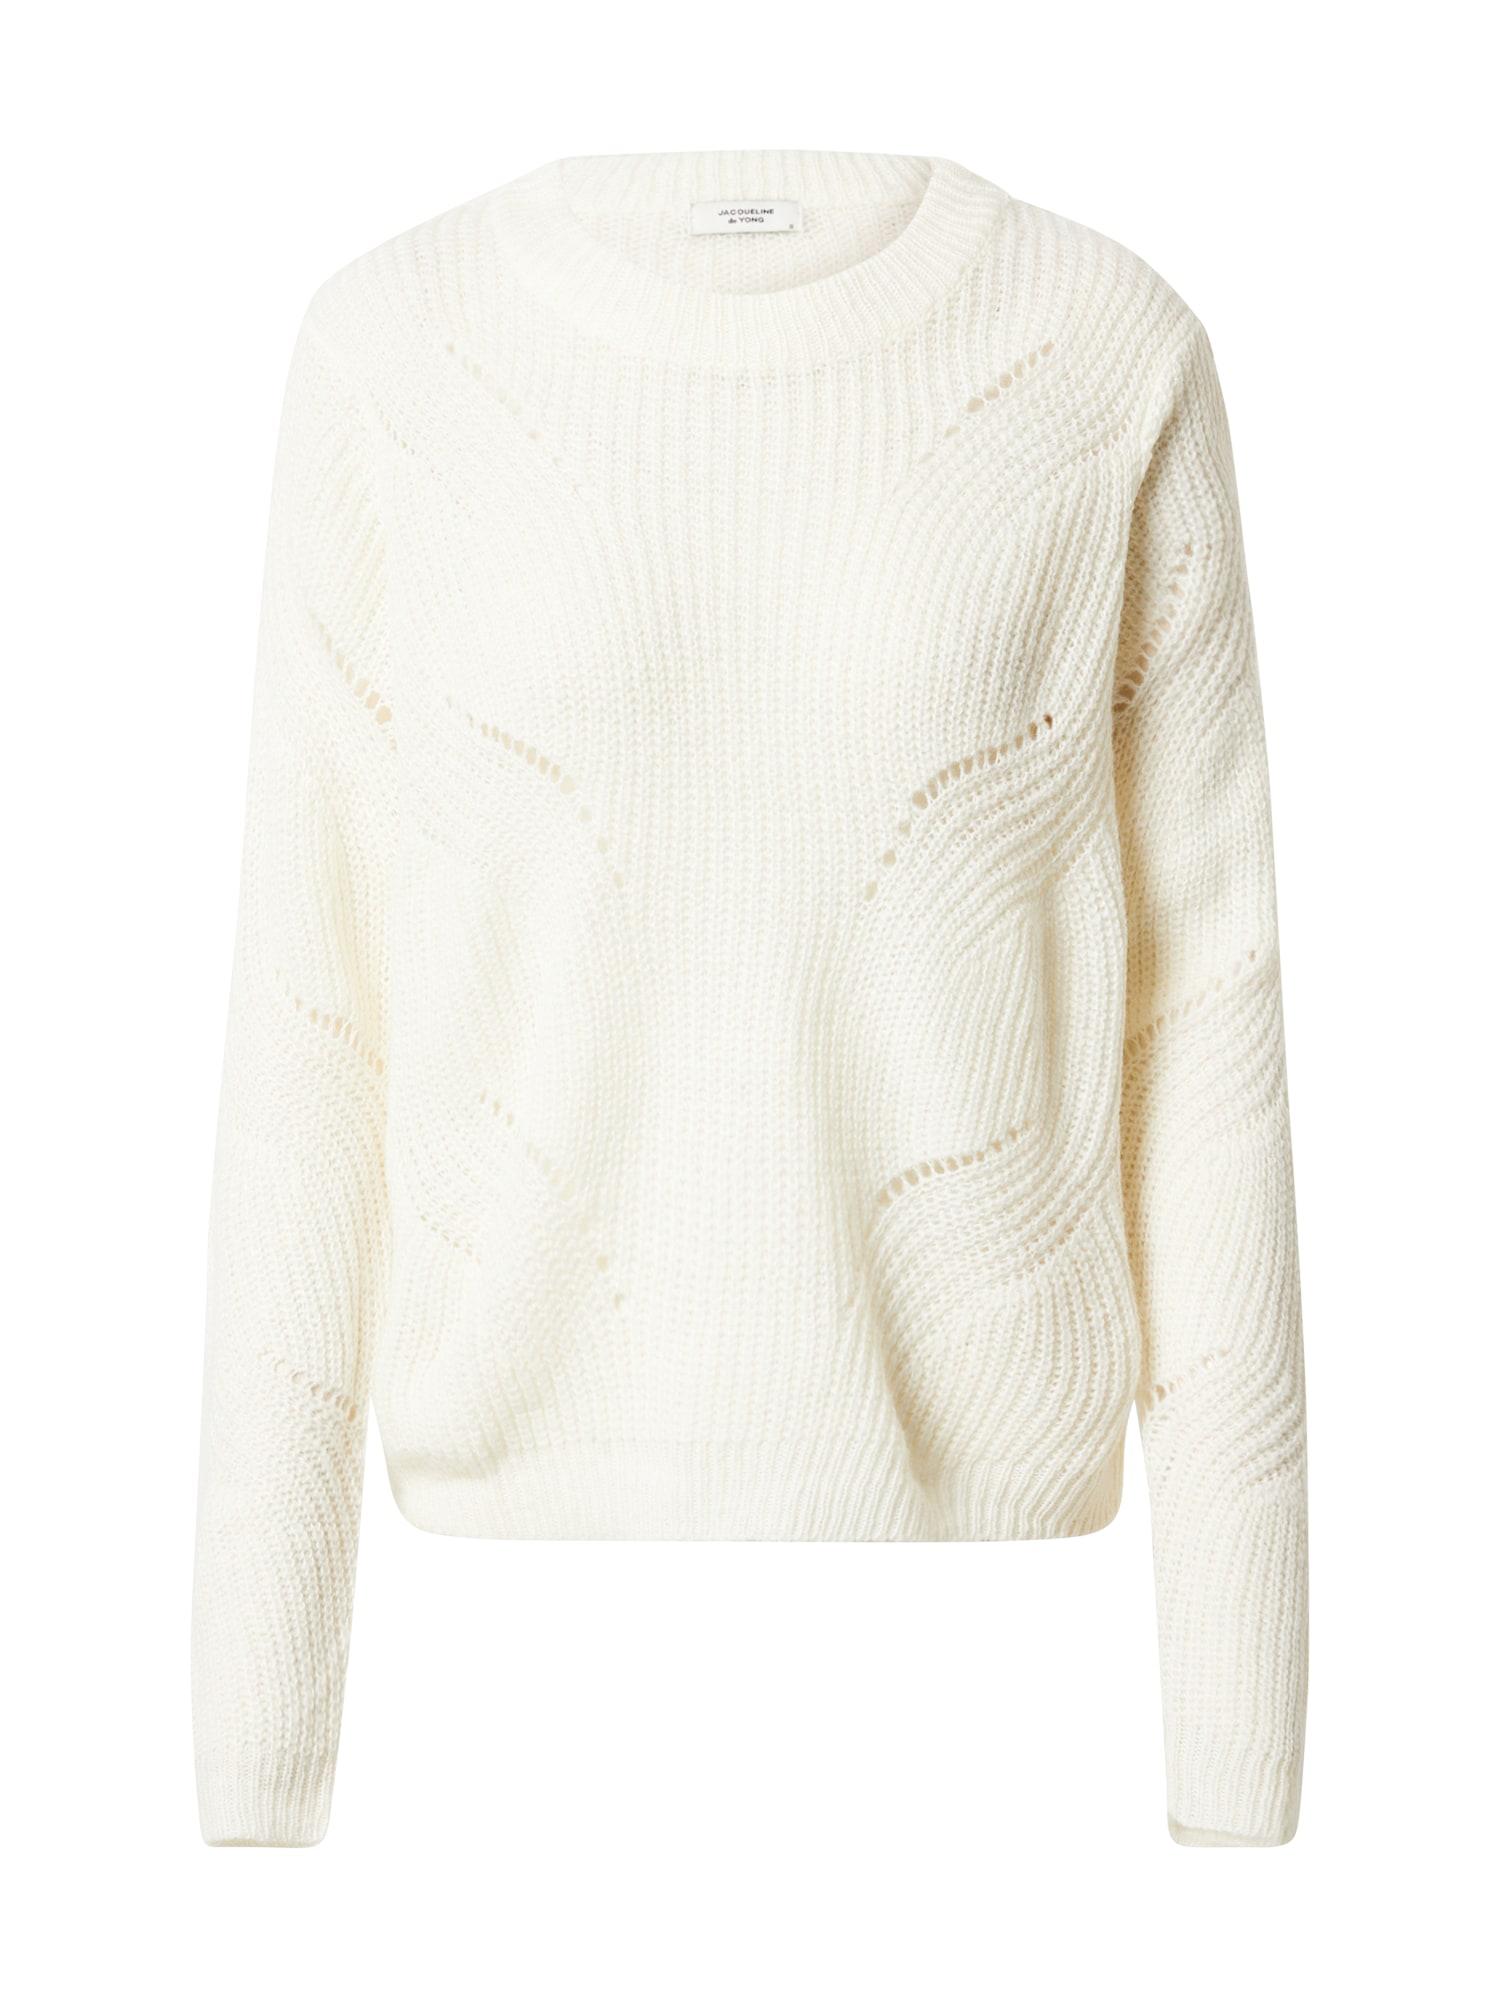 JACQUELINE de YONG Megztinis 'New Daisy' margai balta